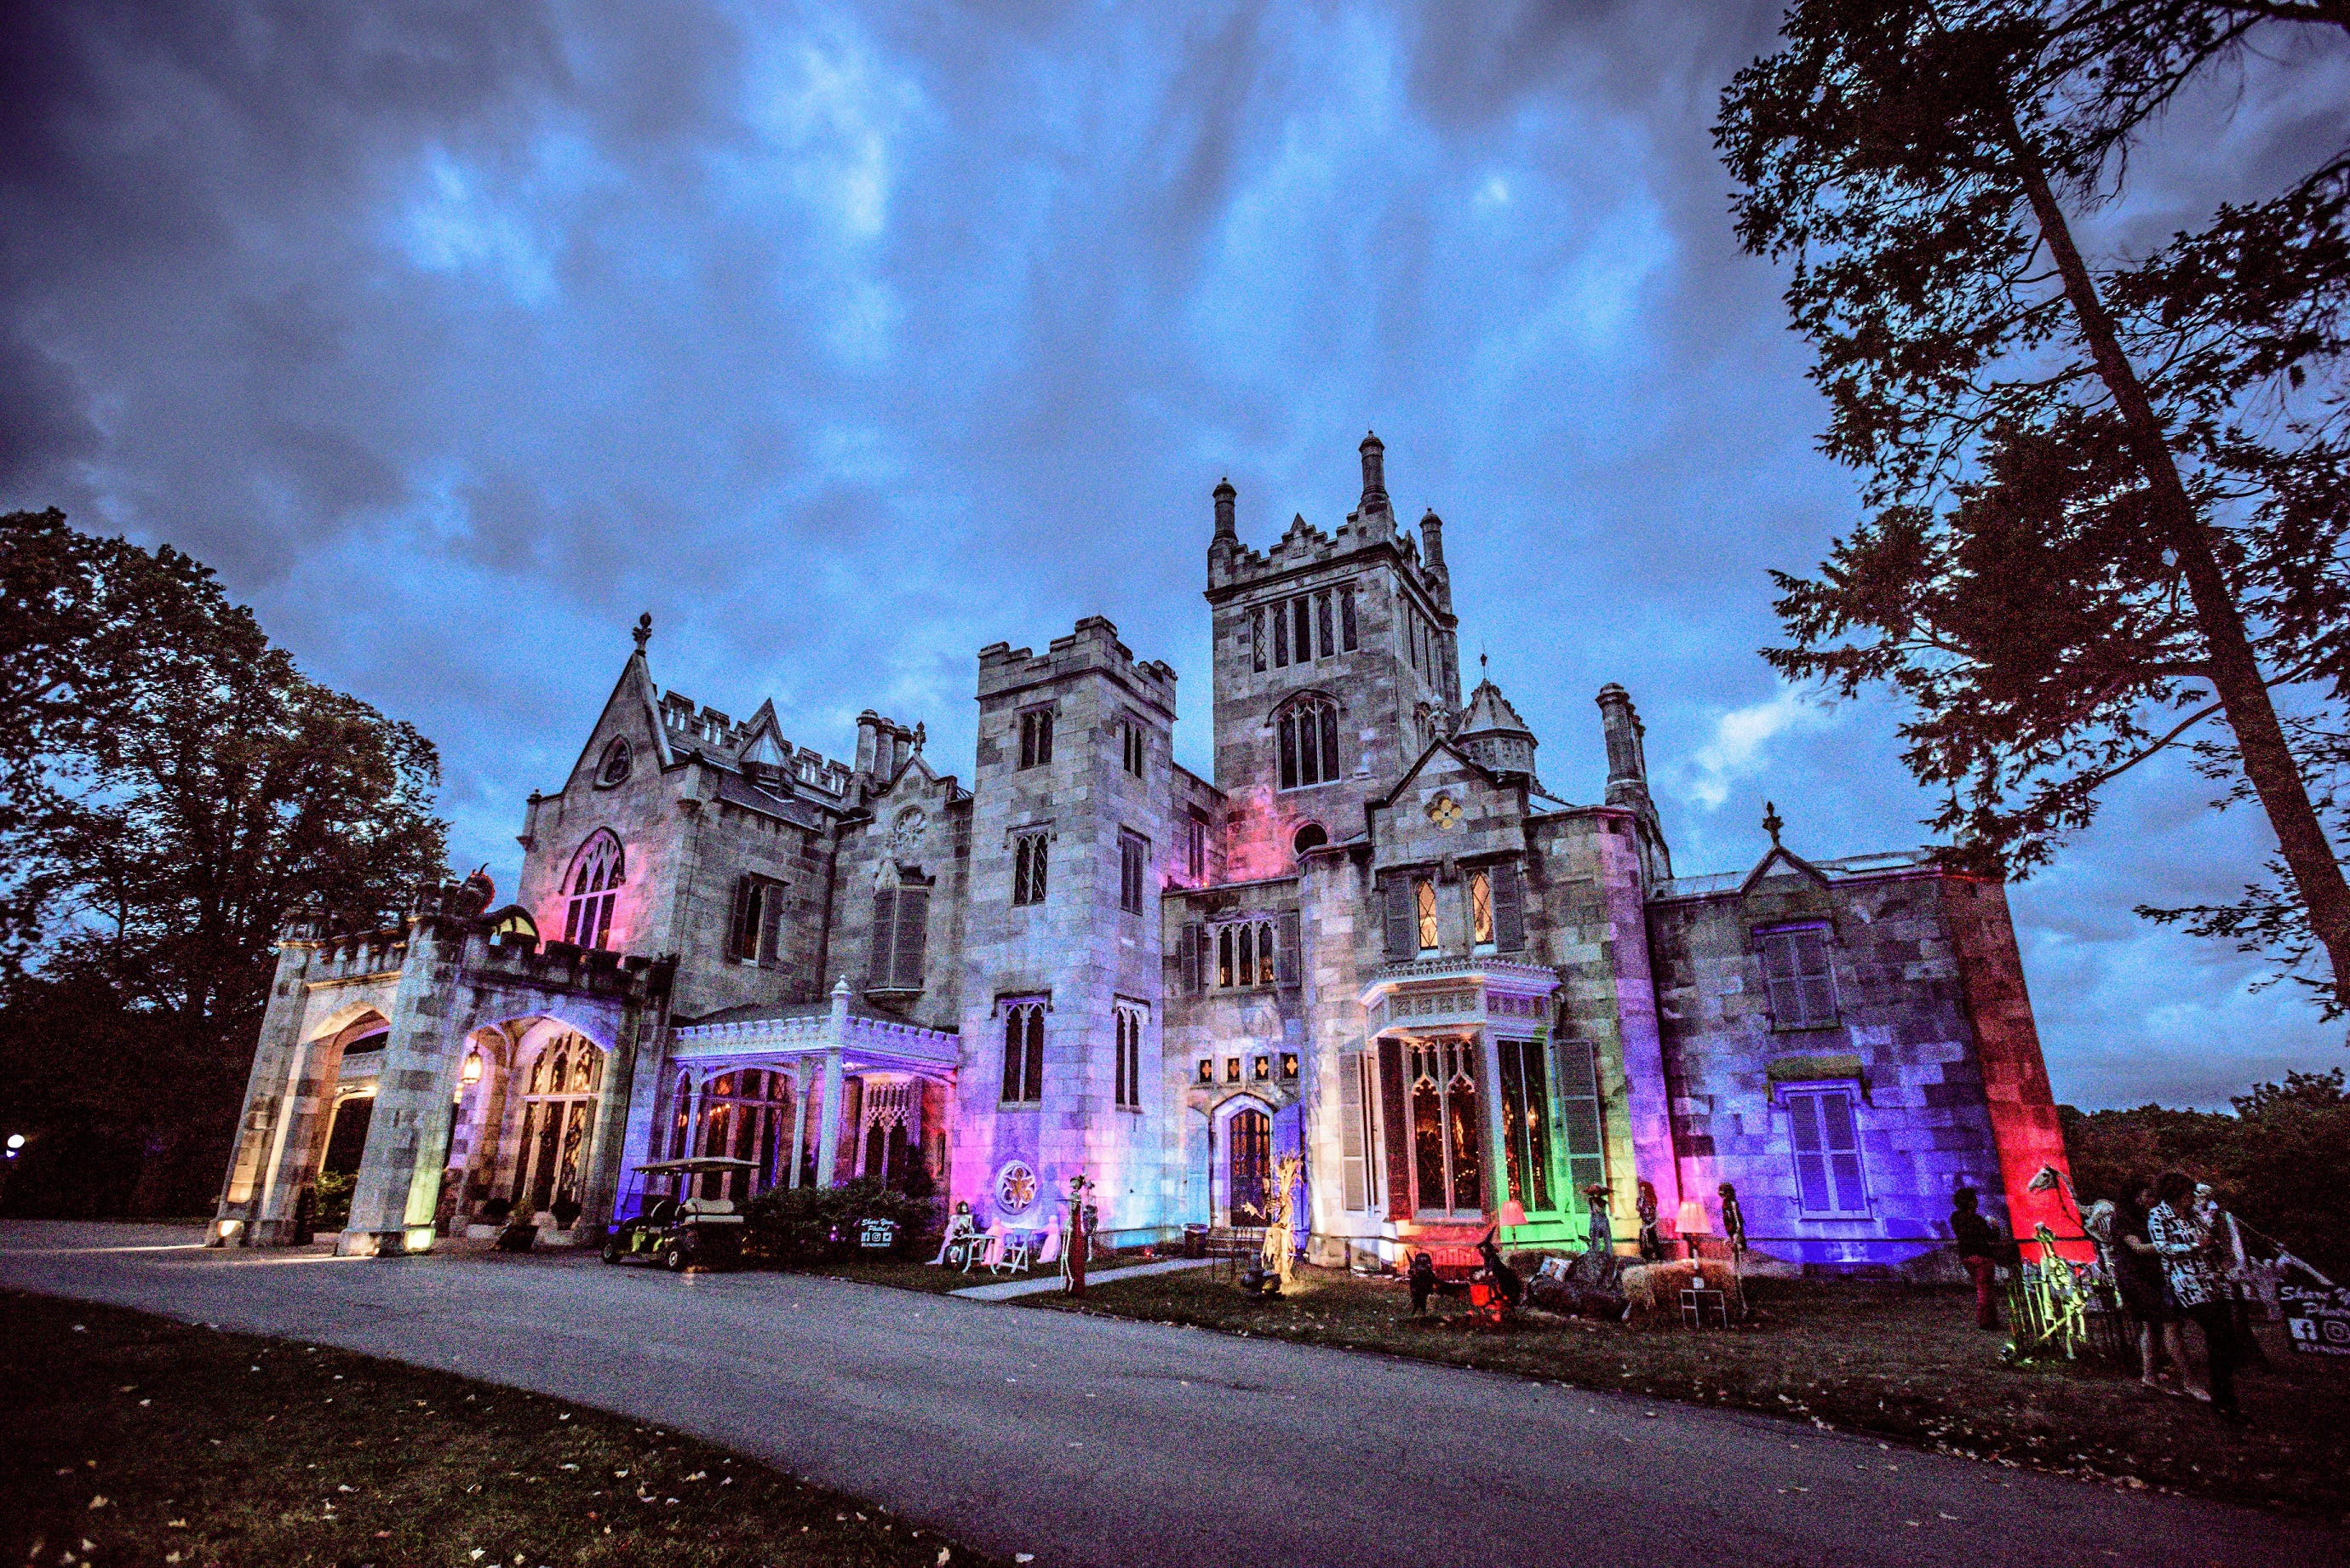 Halloween In Sleepy Hollow Ny 2020 Sleepy Hollow during Halloween season: 7 things to do